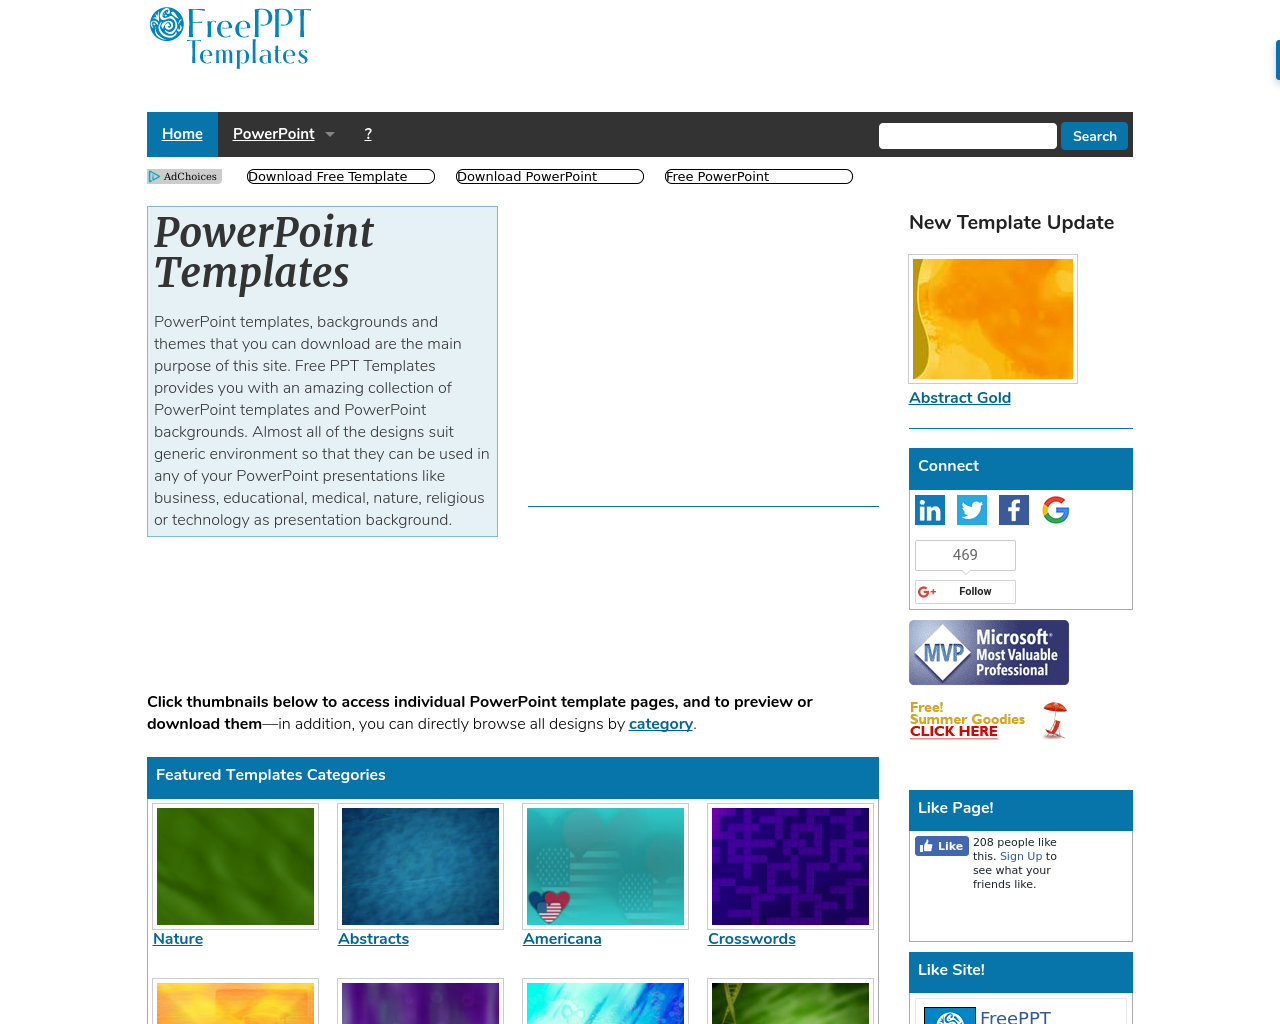 Free Ppt Templates Advertising Mediakits, Reviews, Pricing, Traffic ...